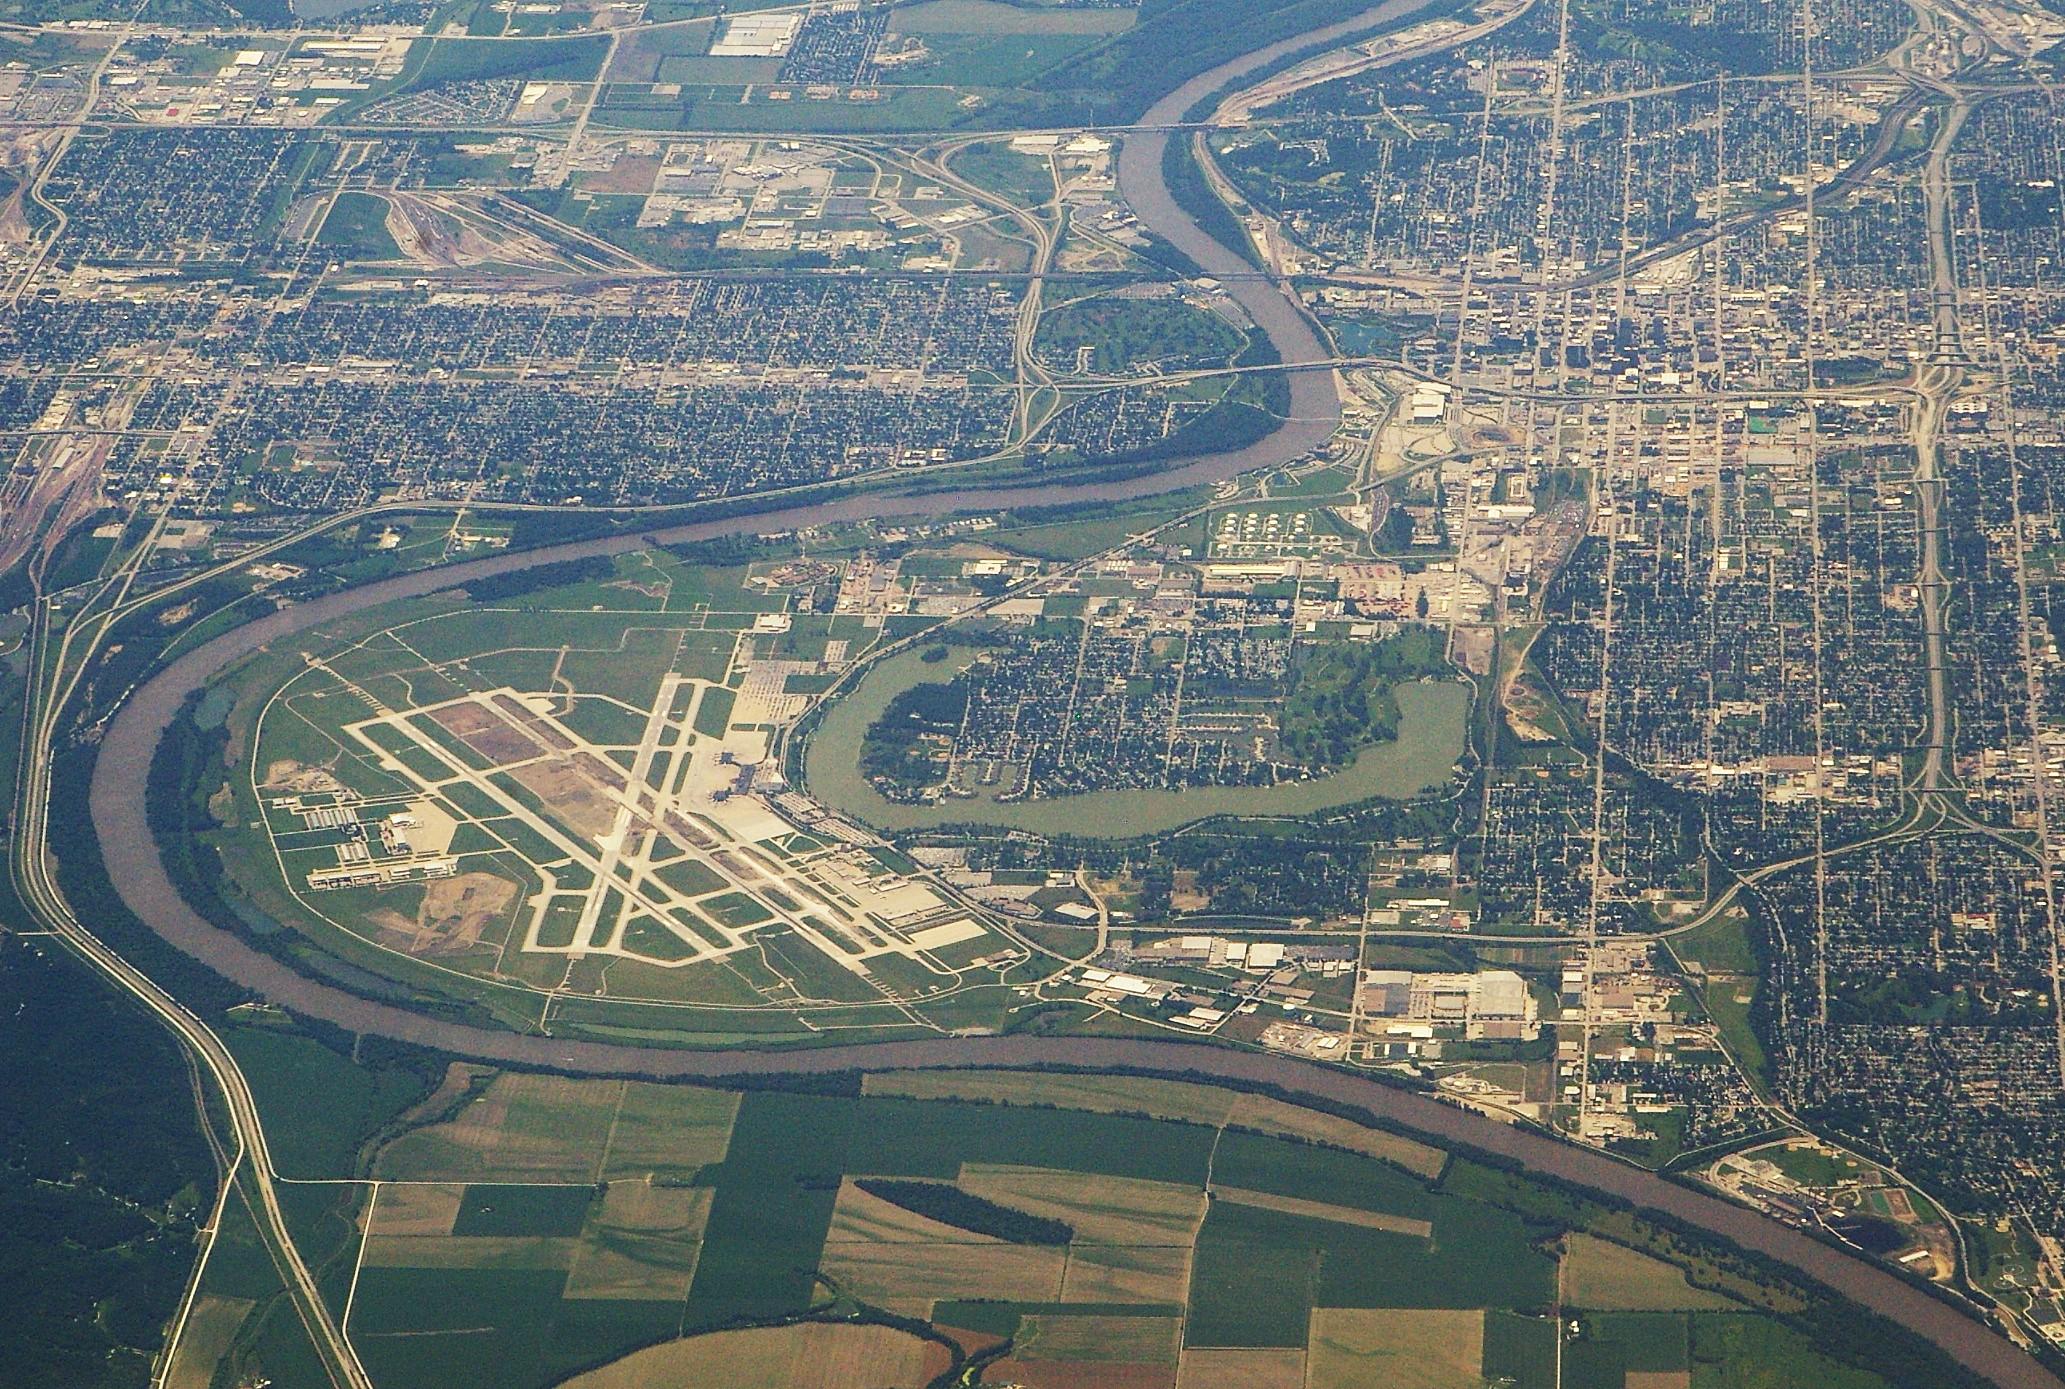 File:Omaha, Nebraska (OMA).jpg - Wikimedia Commons